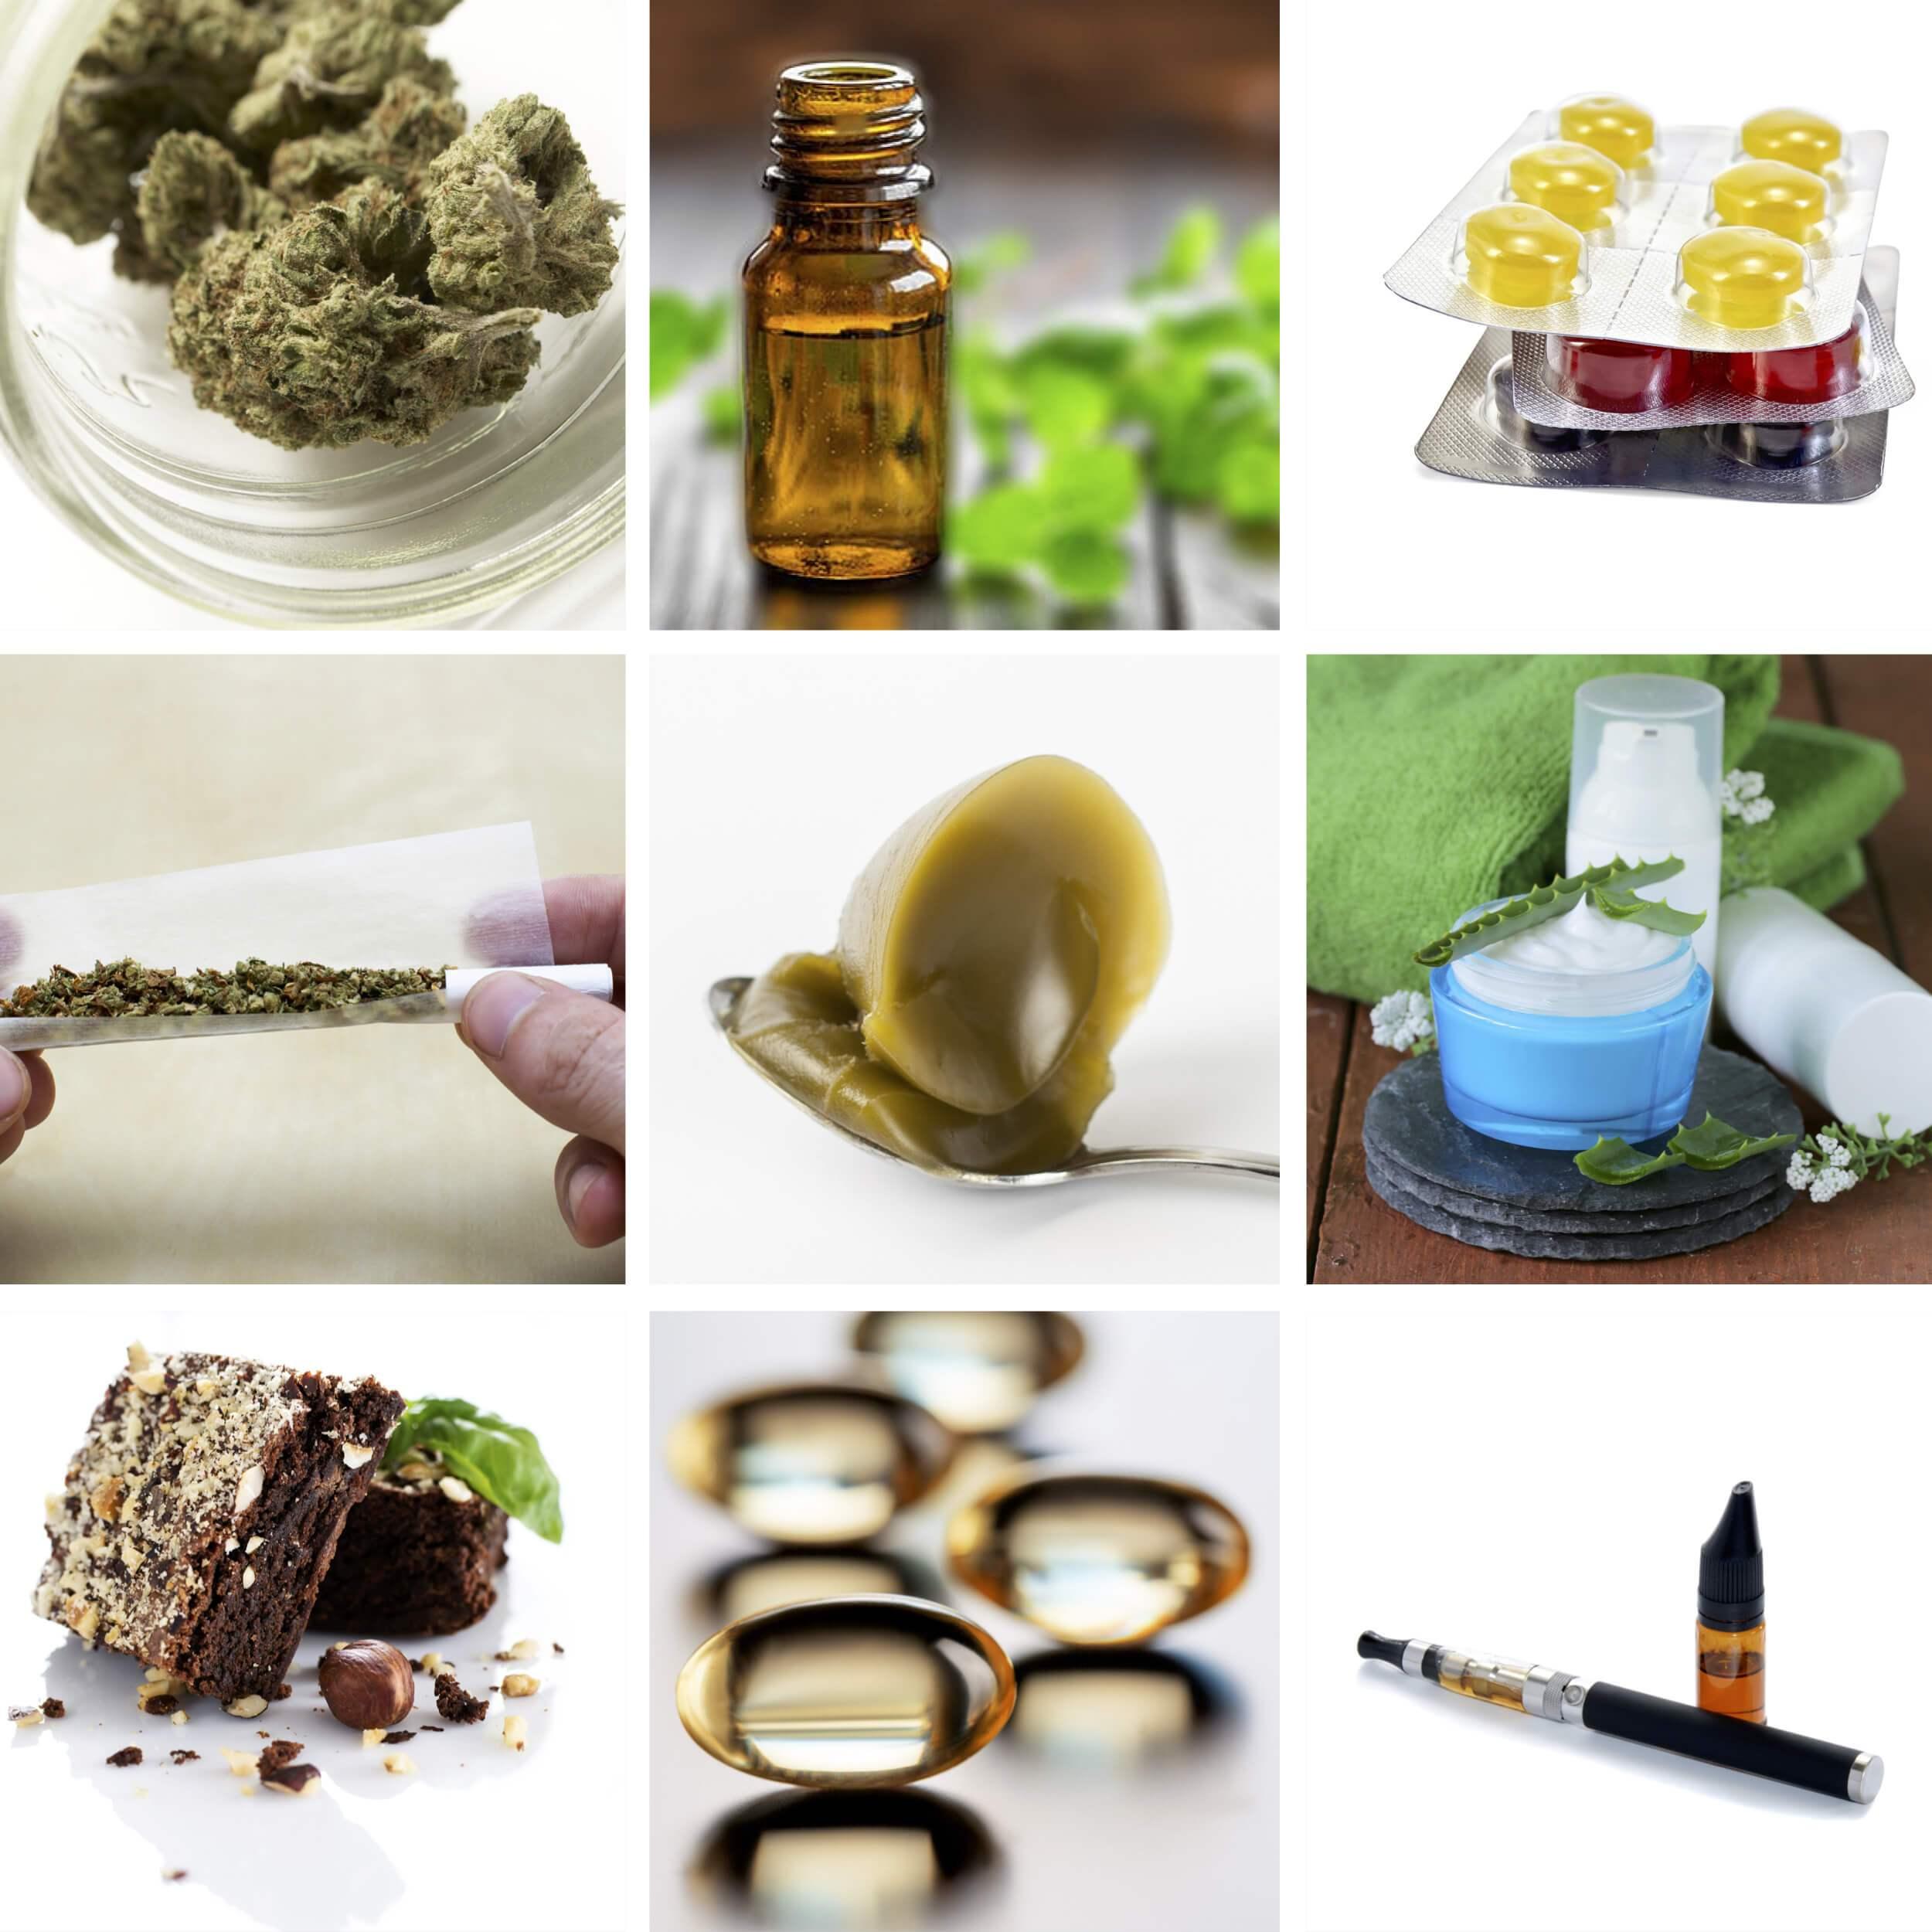 Top Ways to Consume Marijuana